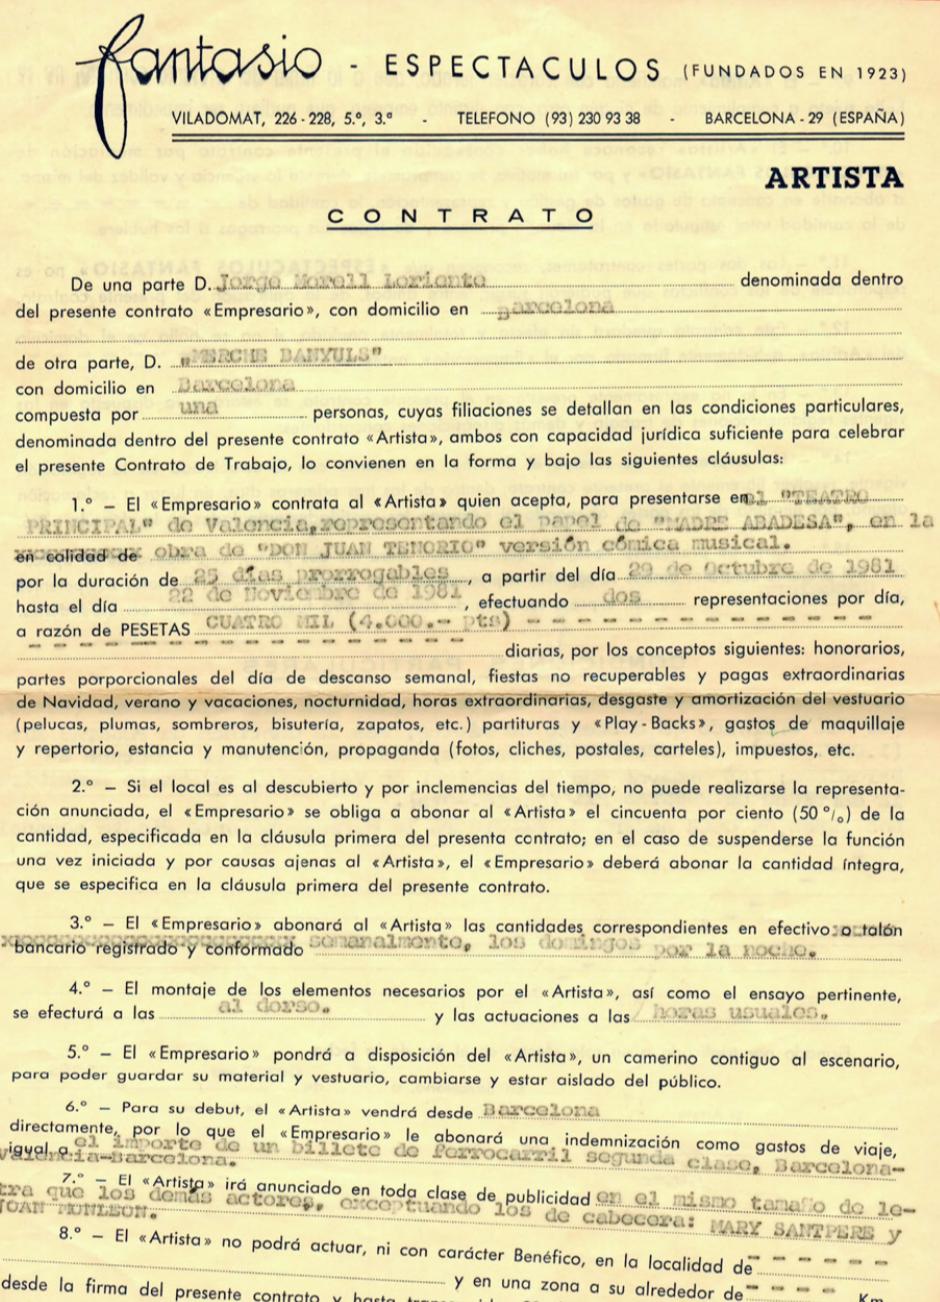 1981 Contracte D. Juan Tenorio Teatre Principal